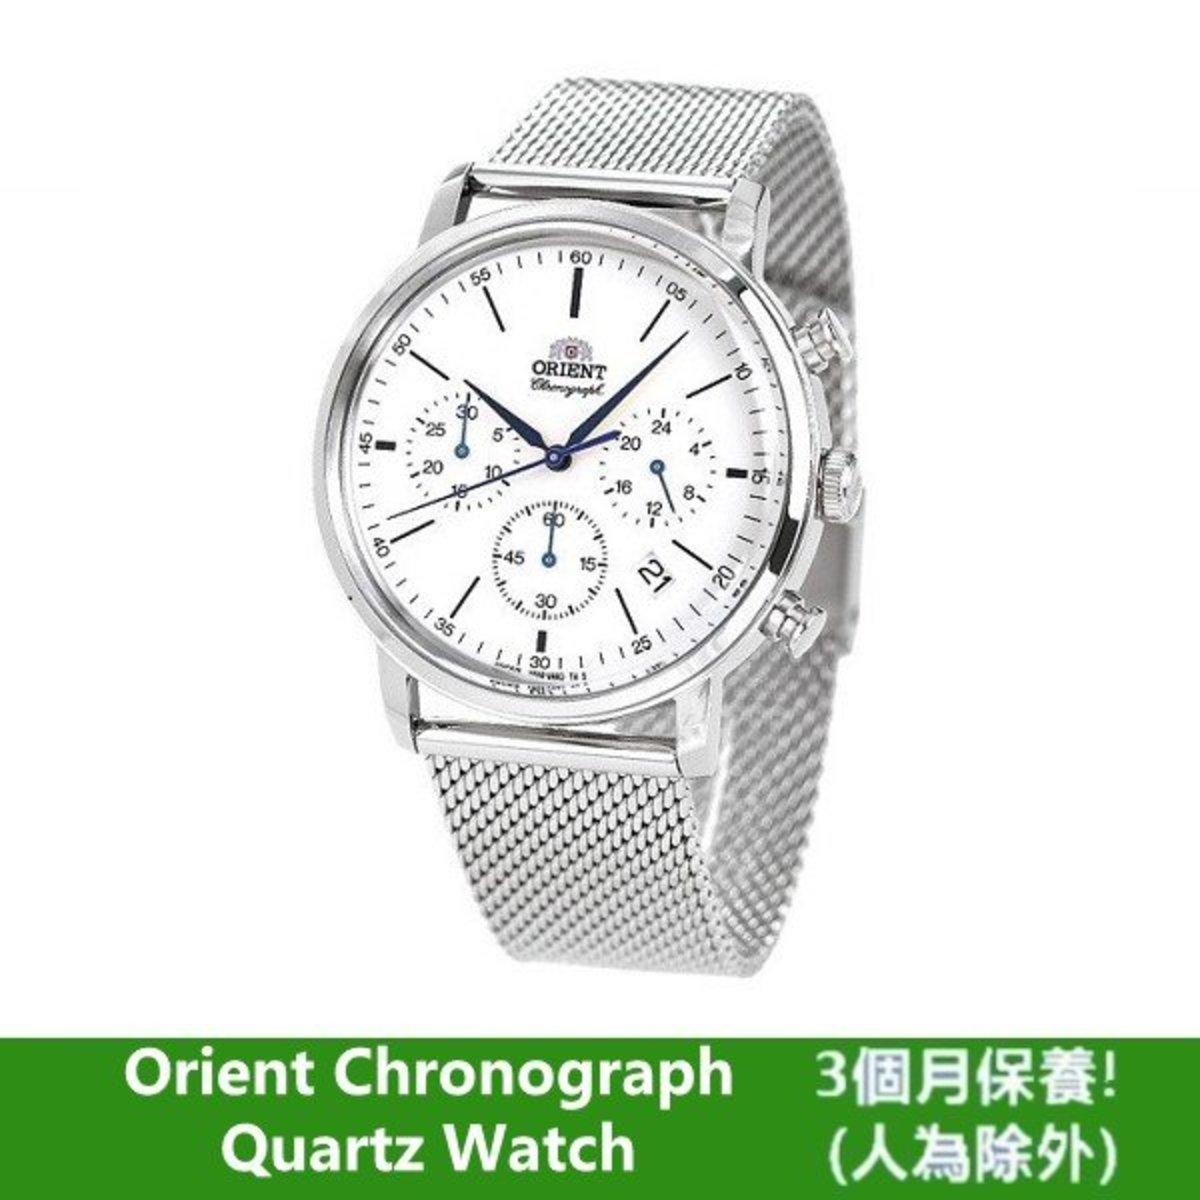 ORIENT 手錶經典款classic 石英計手錶 RN-KV0402S 平行進口